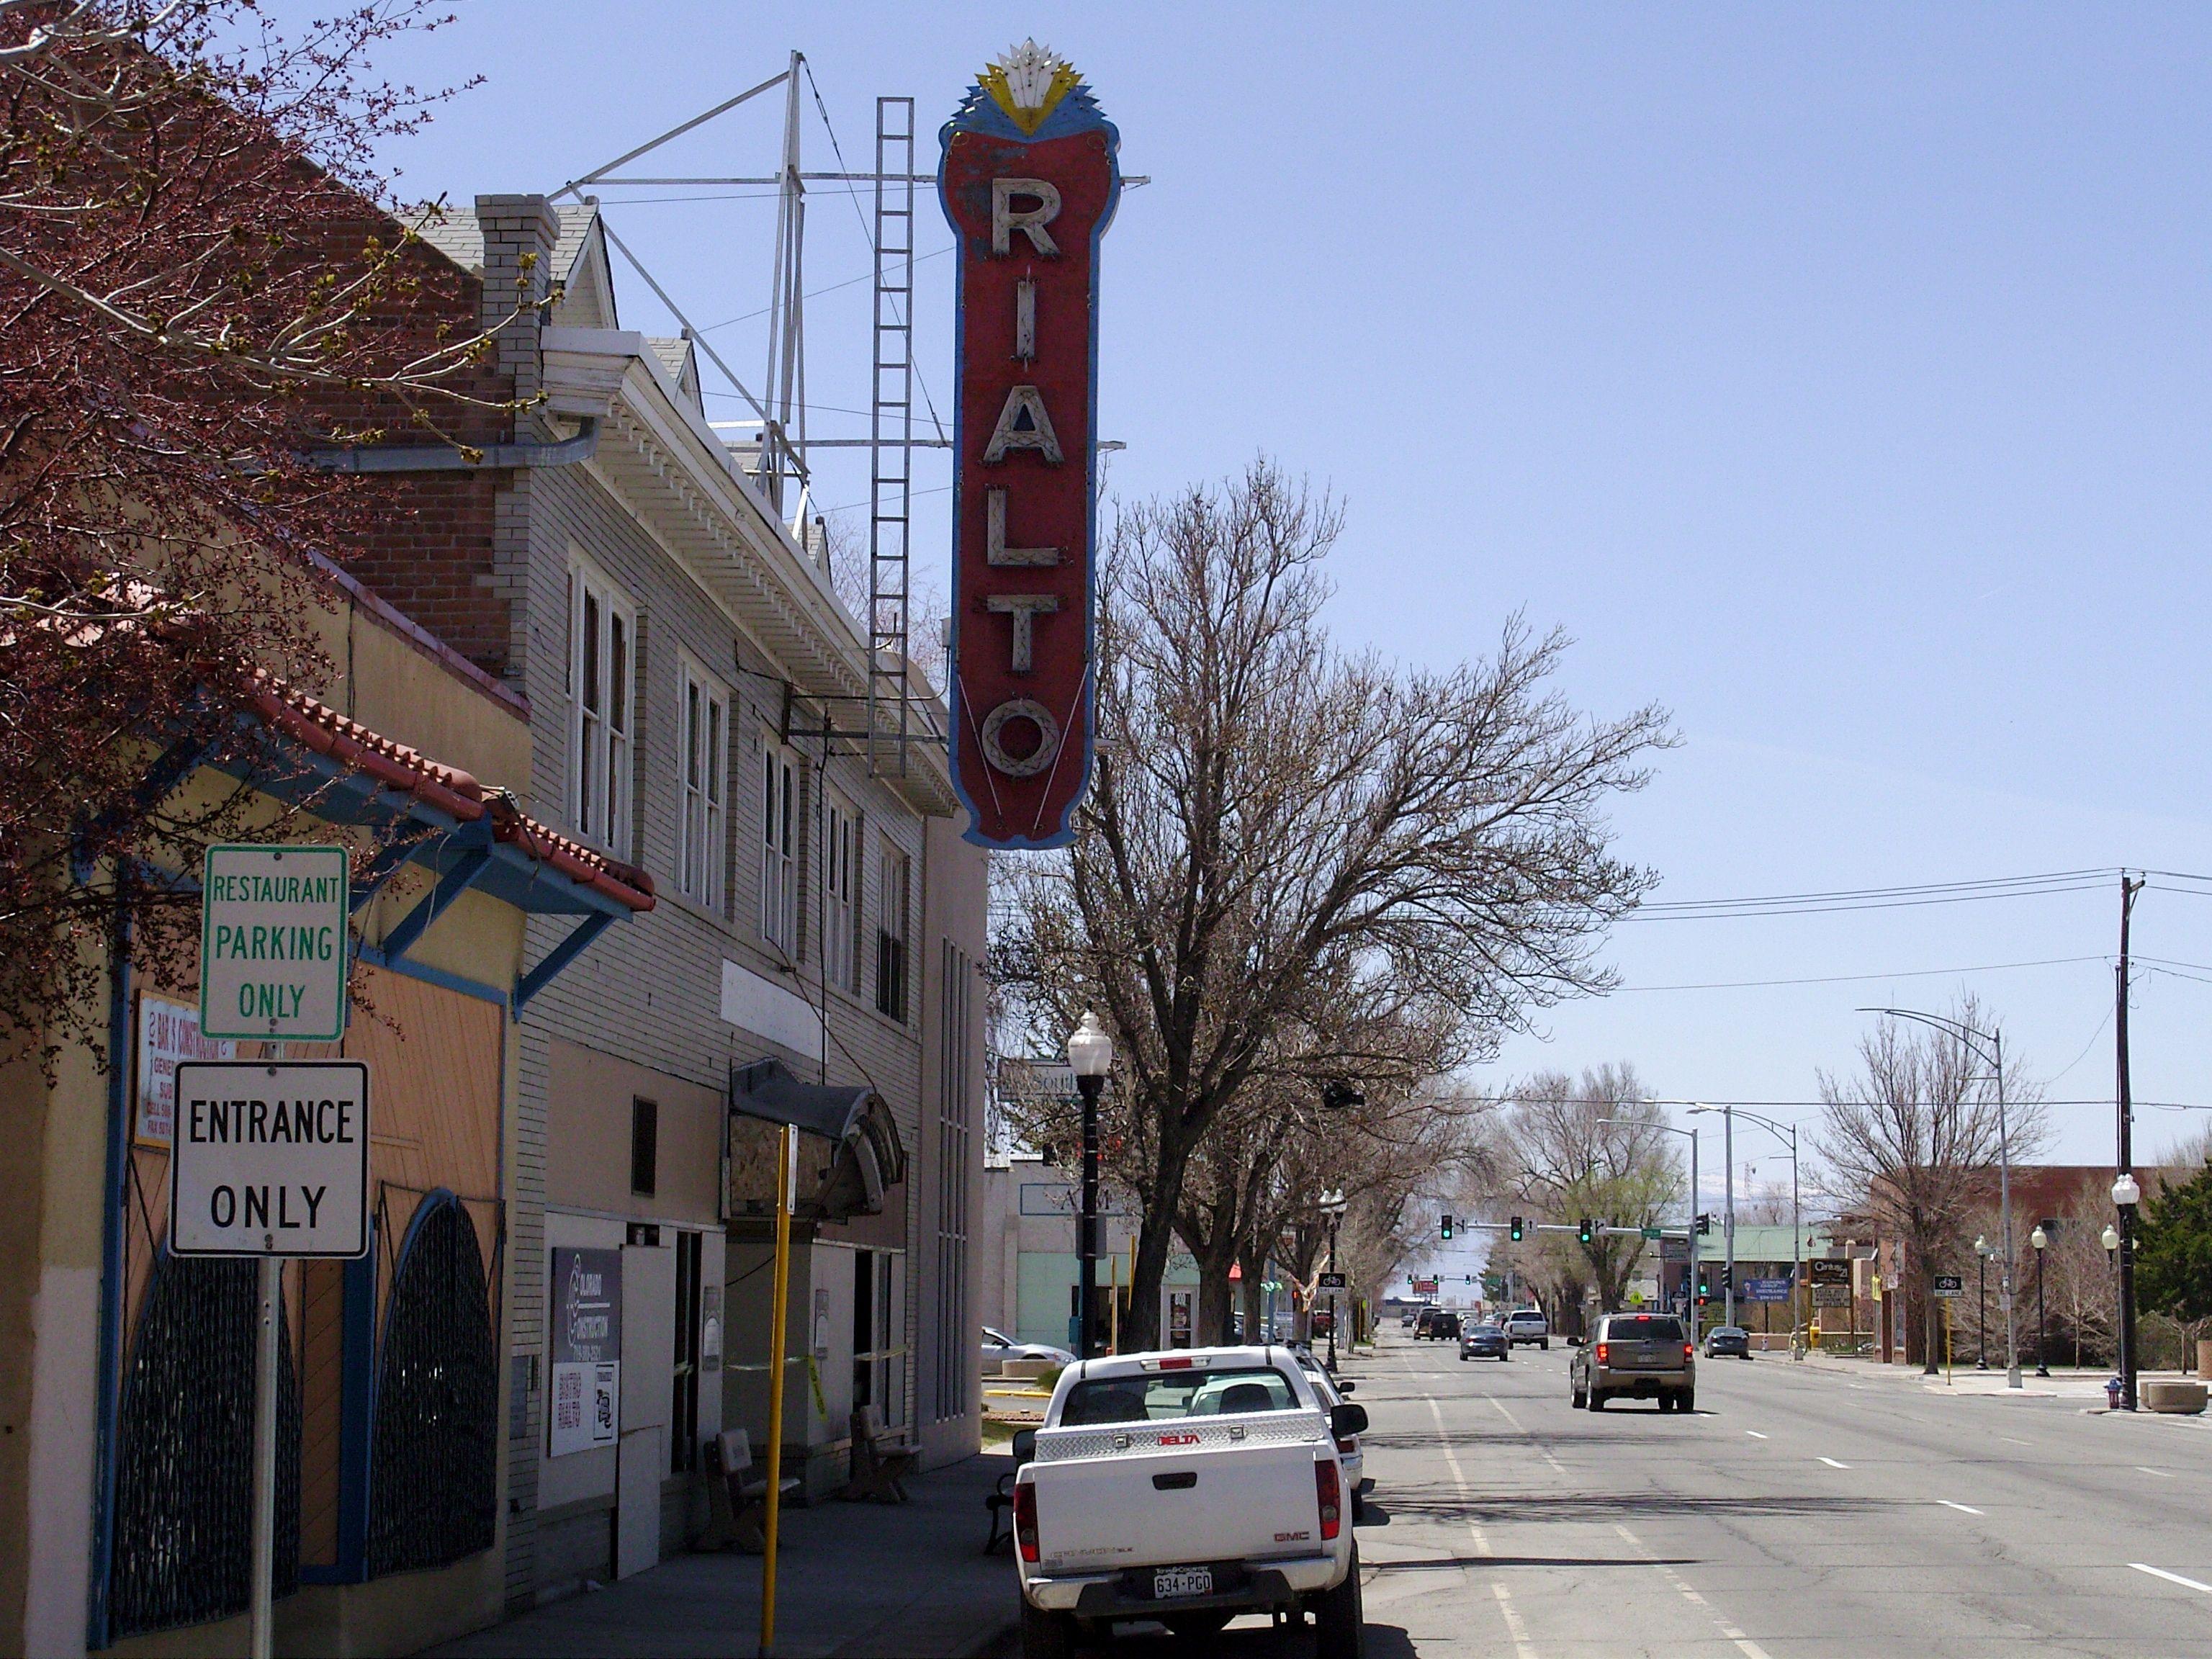 Bistro Rialto 716 Main Street Alamosa Co 719 589 3039